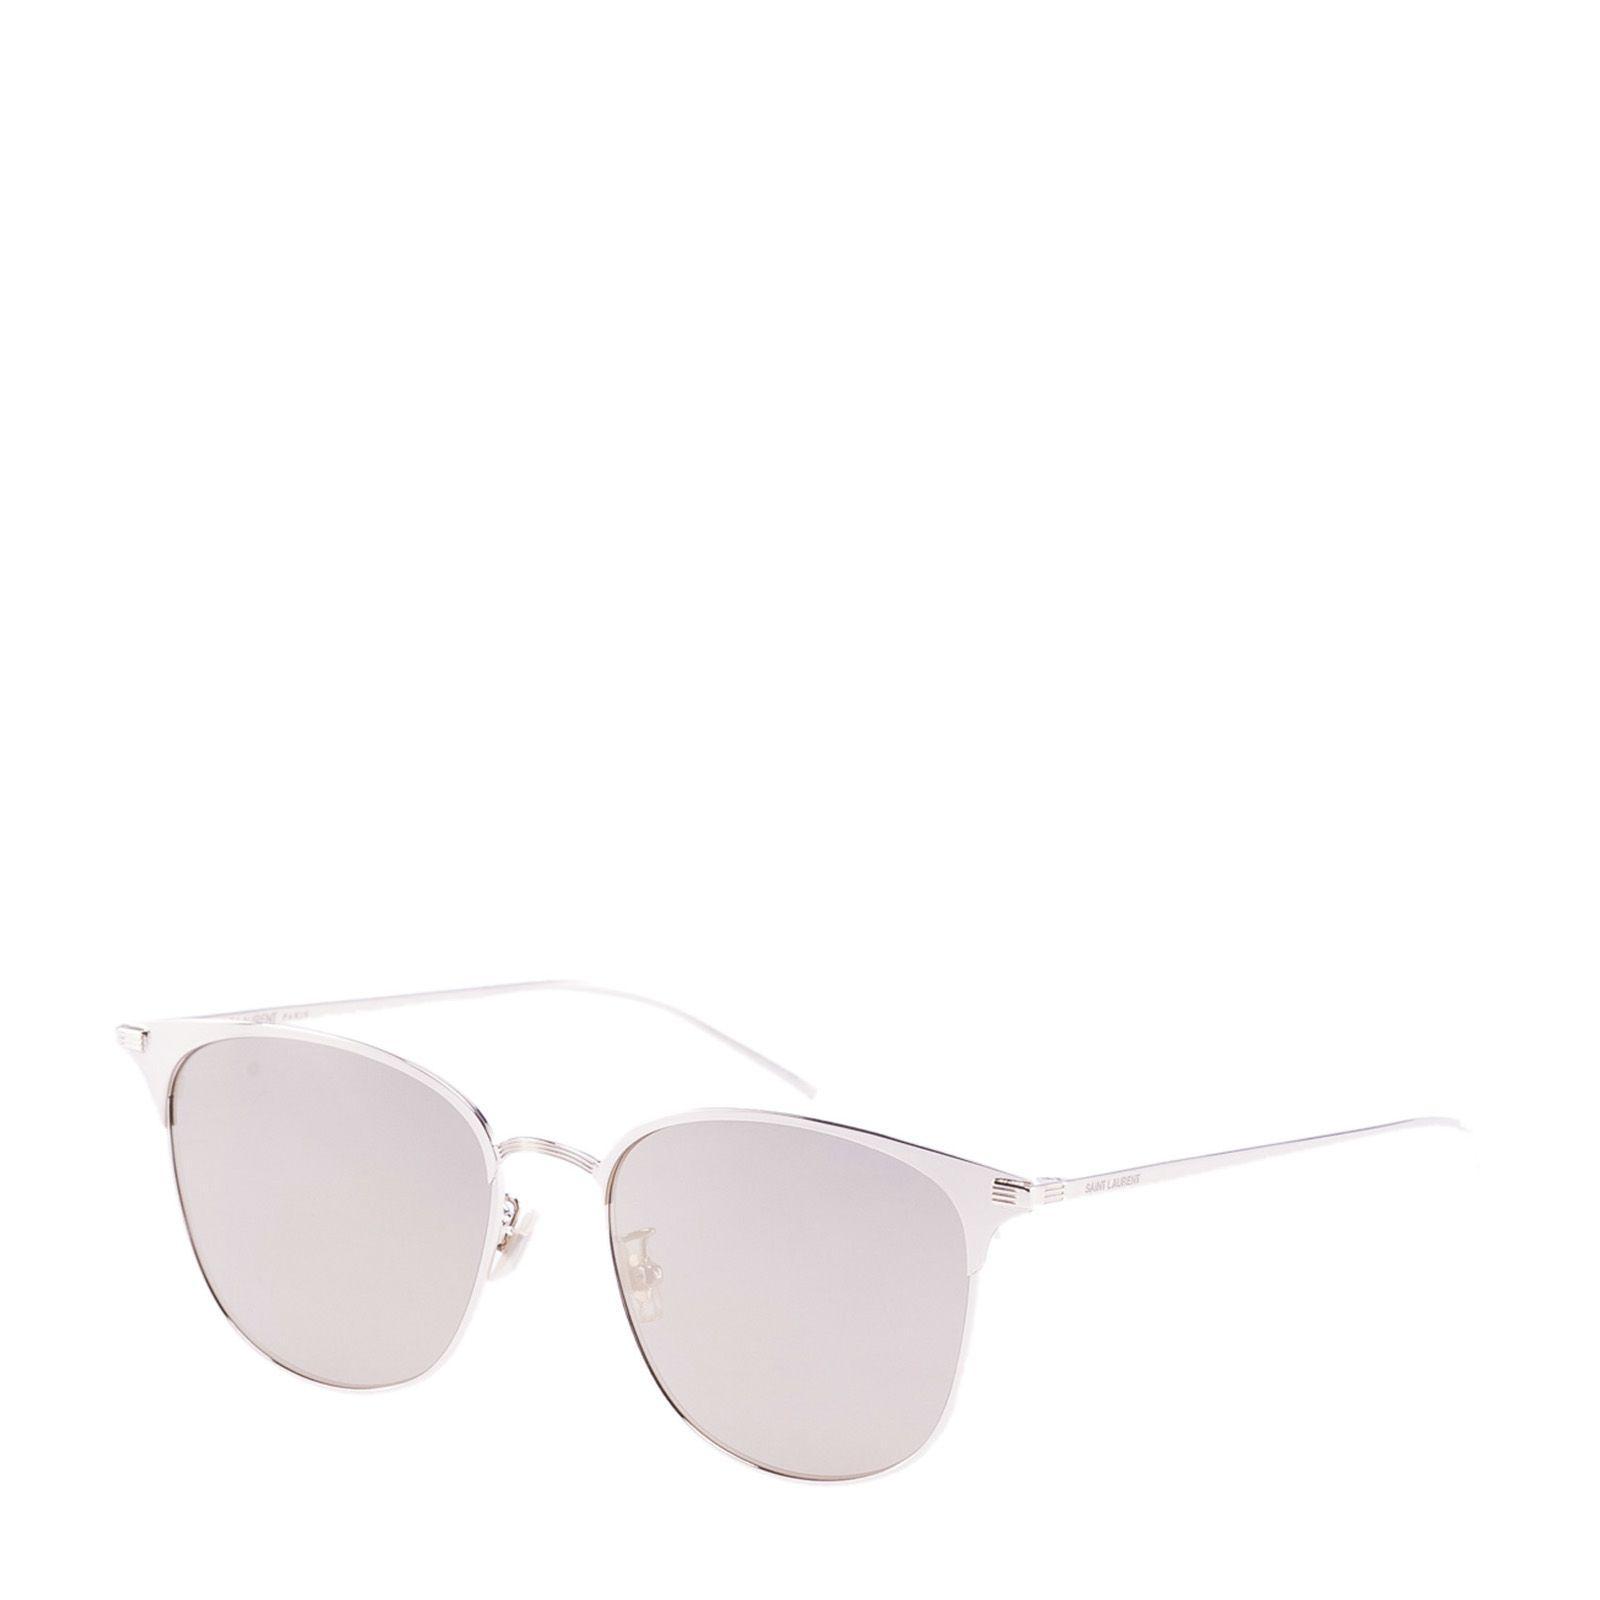 Saint Laurent Eyewear 48 T Sunglasses In Light Gold